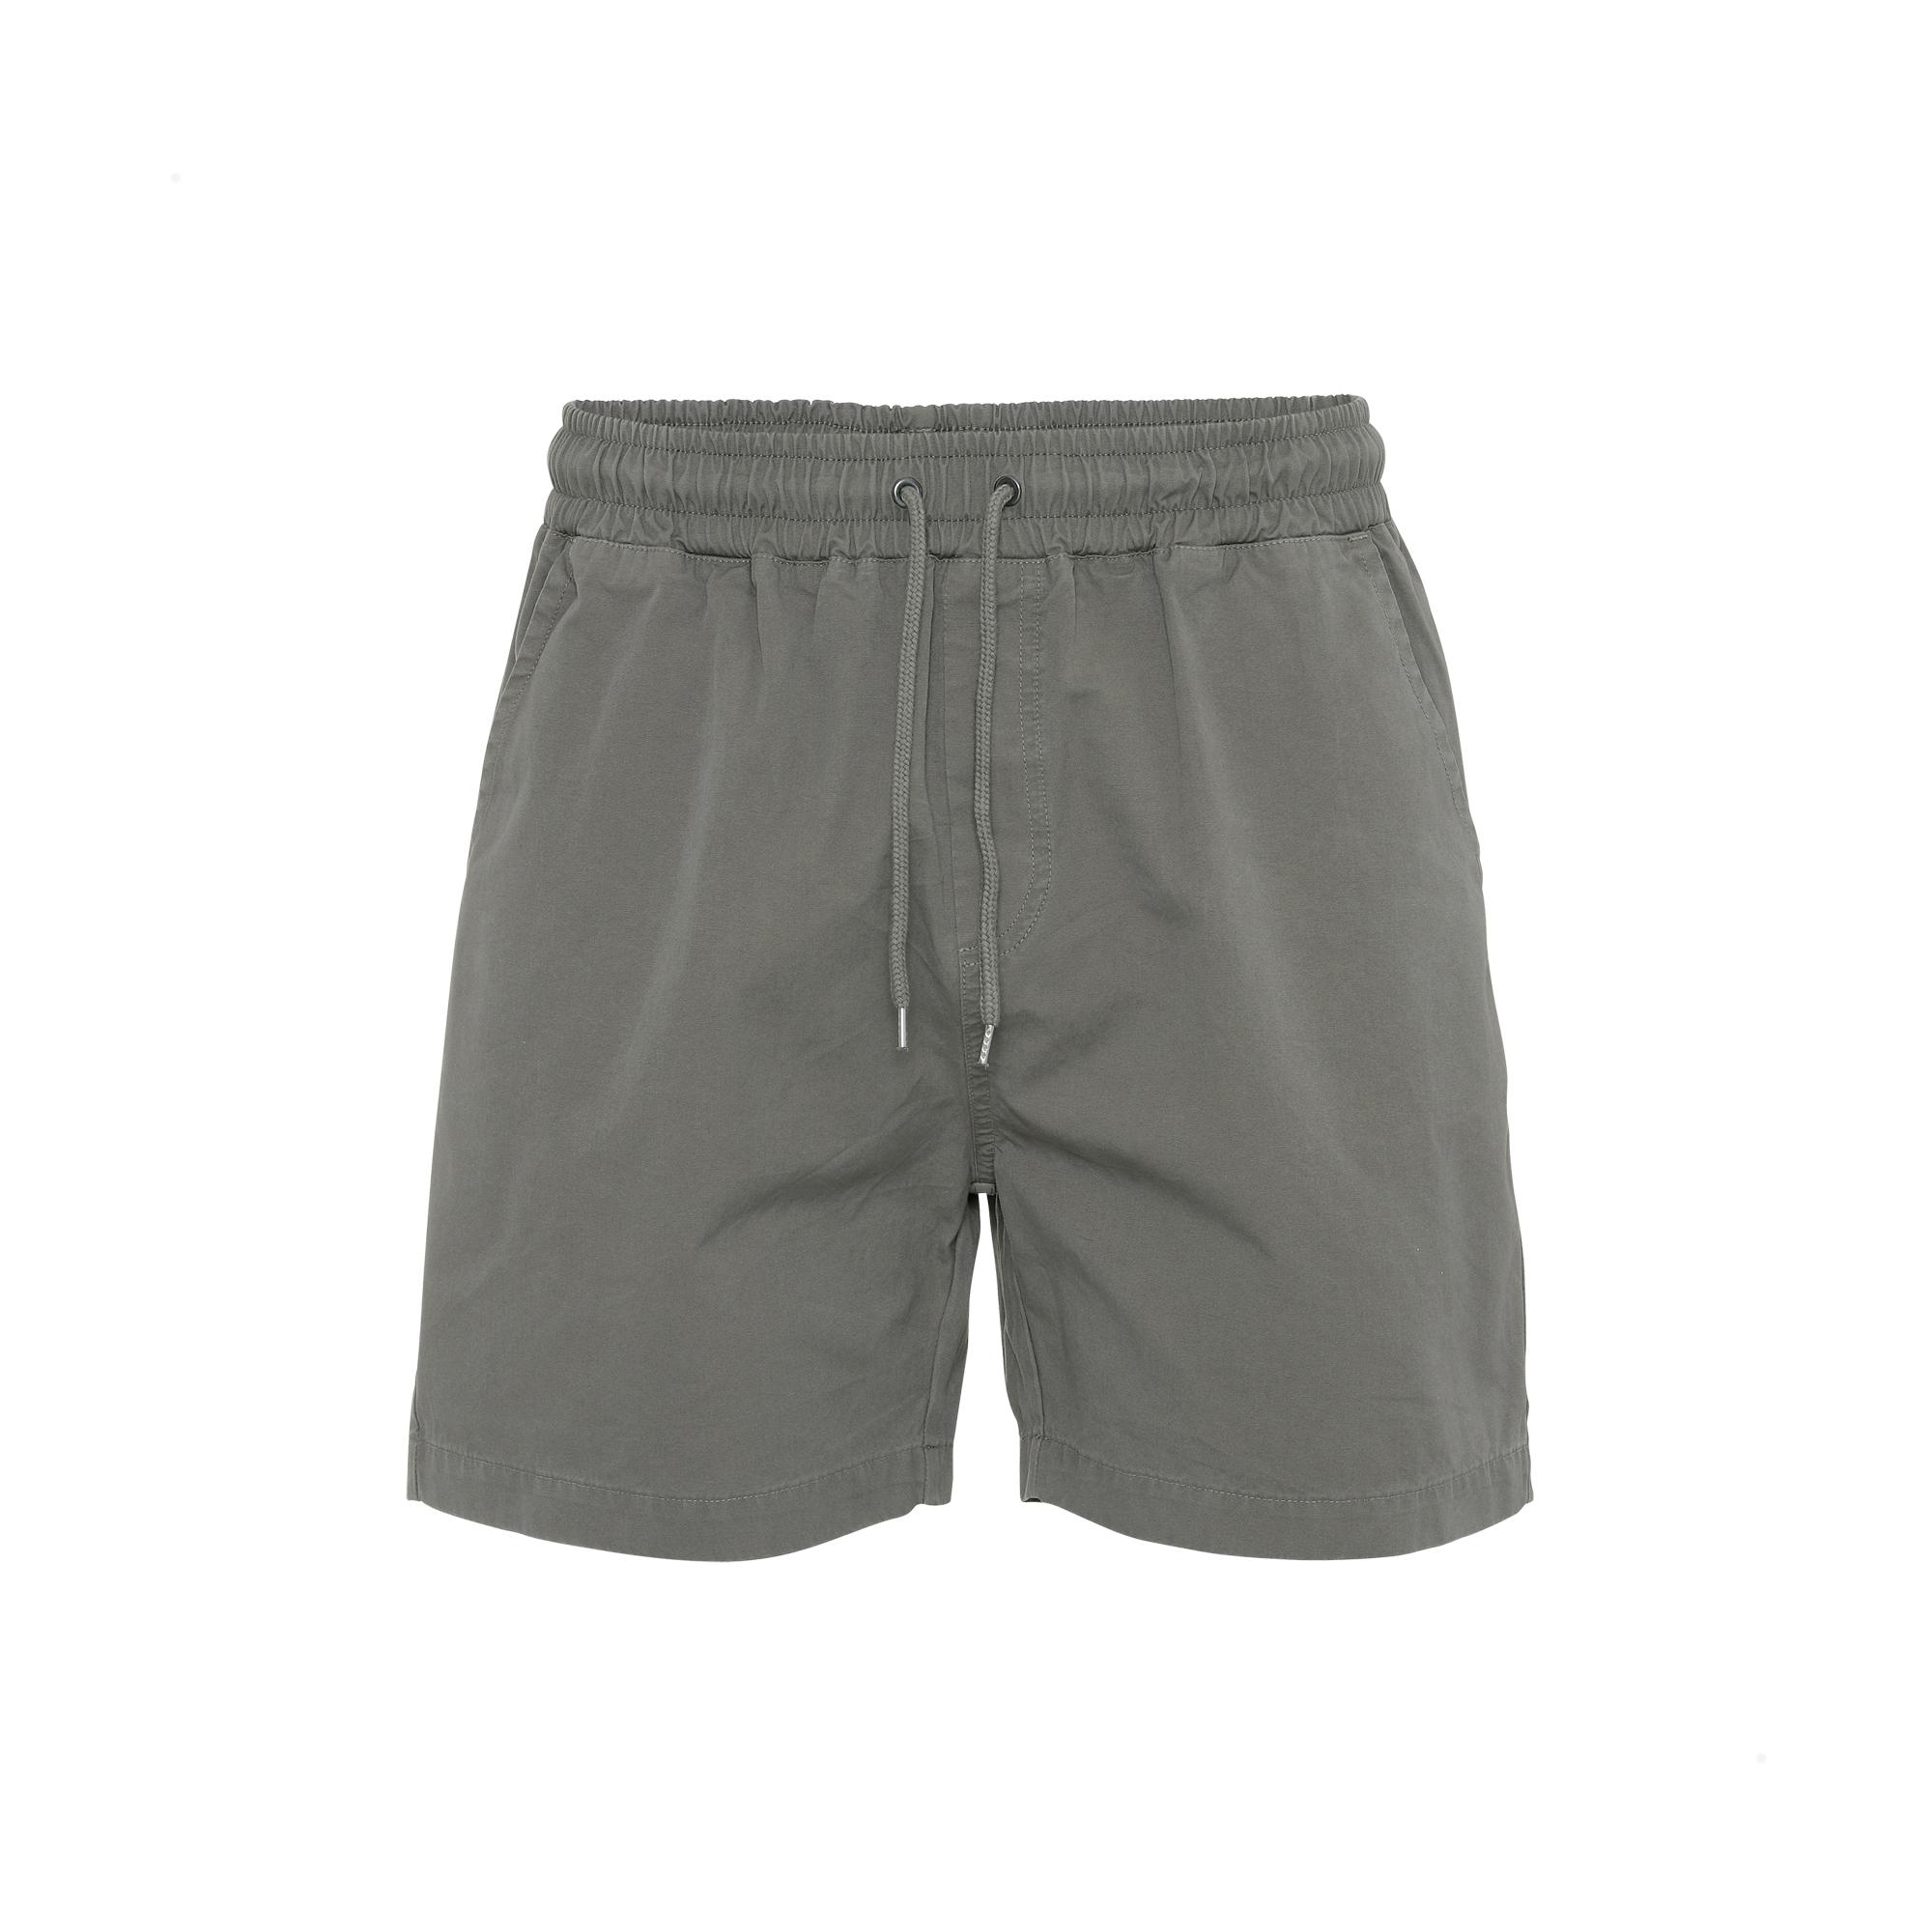 Colorful Standard Organic Twill Shorts